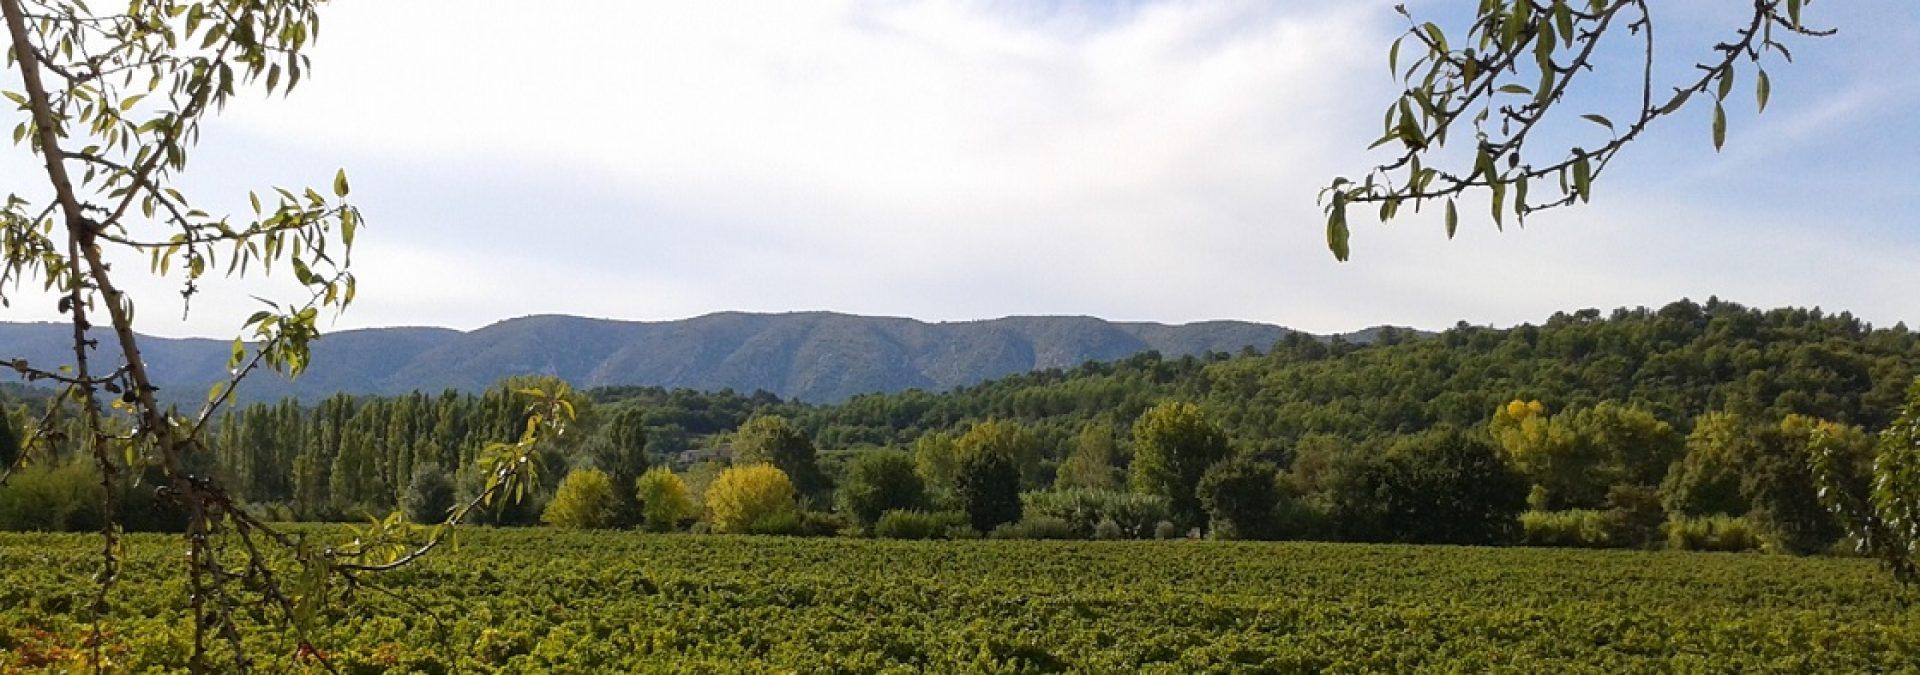 Domaine La Garelle